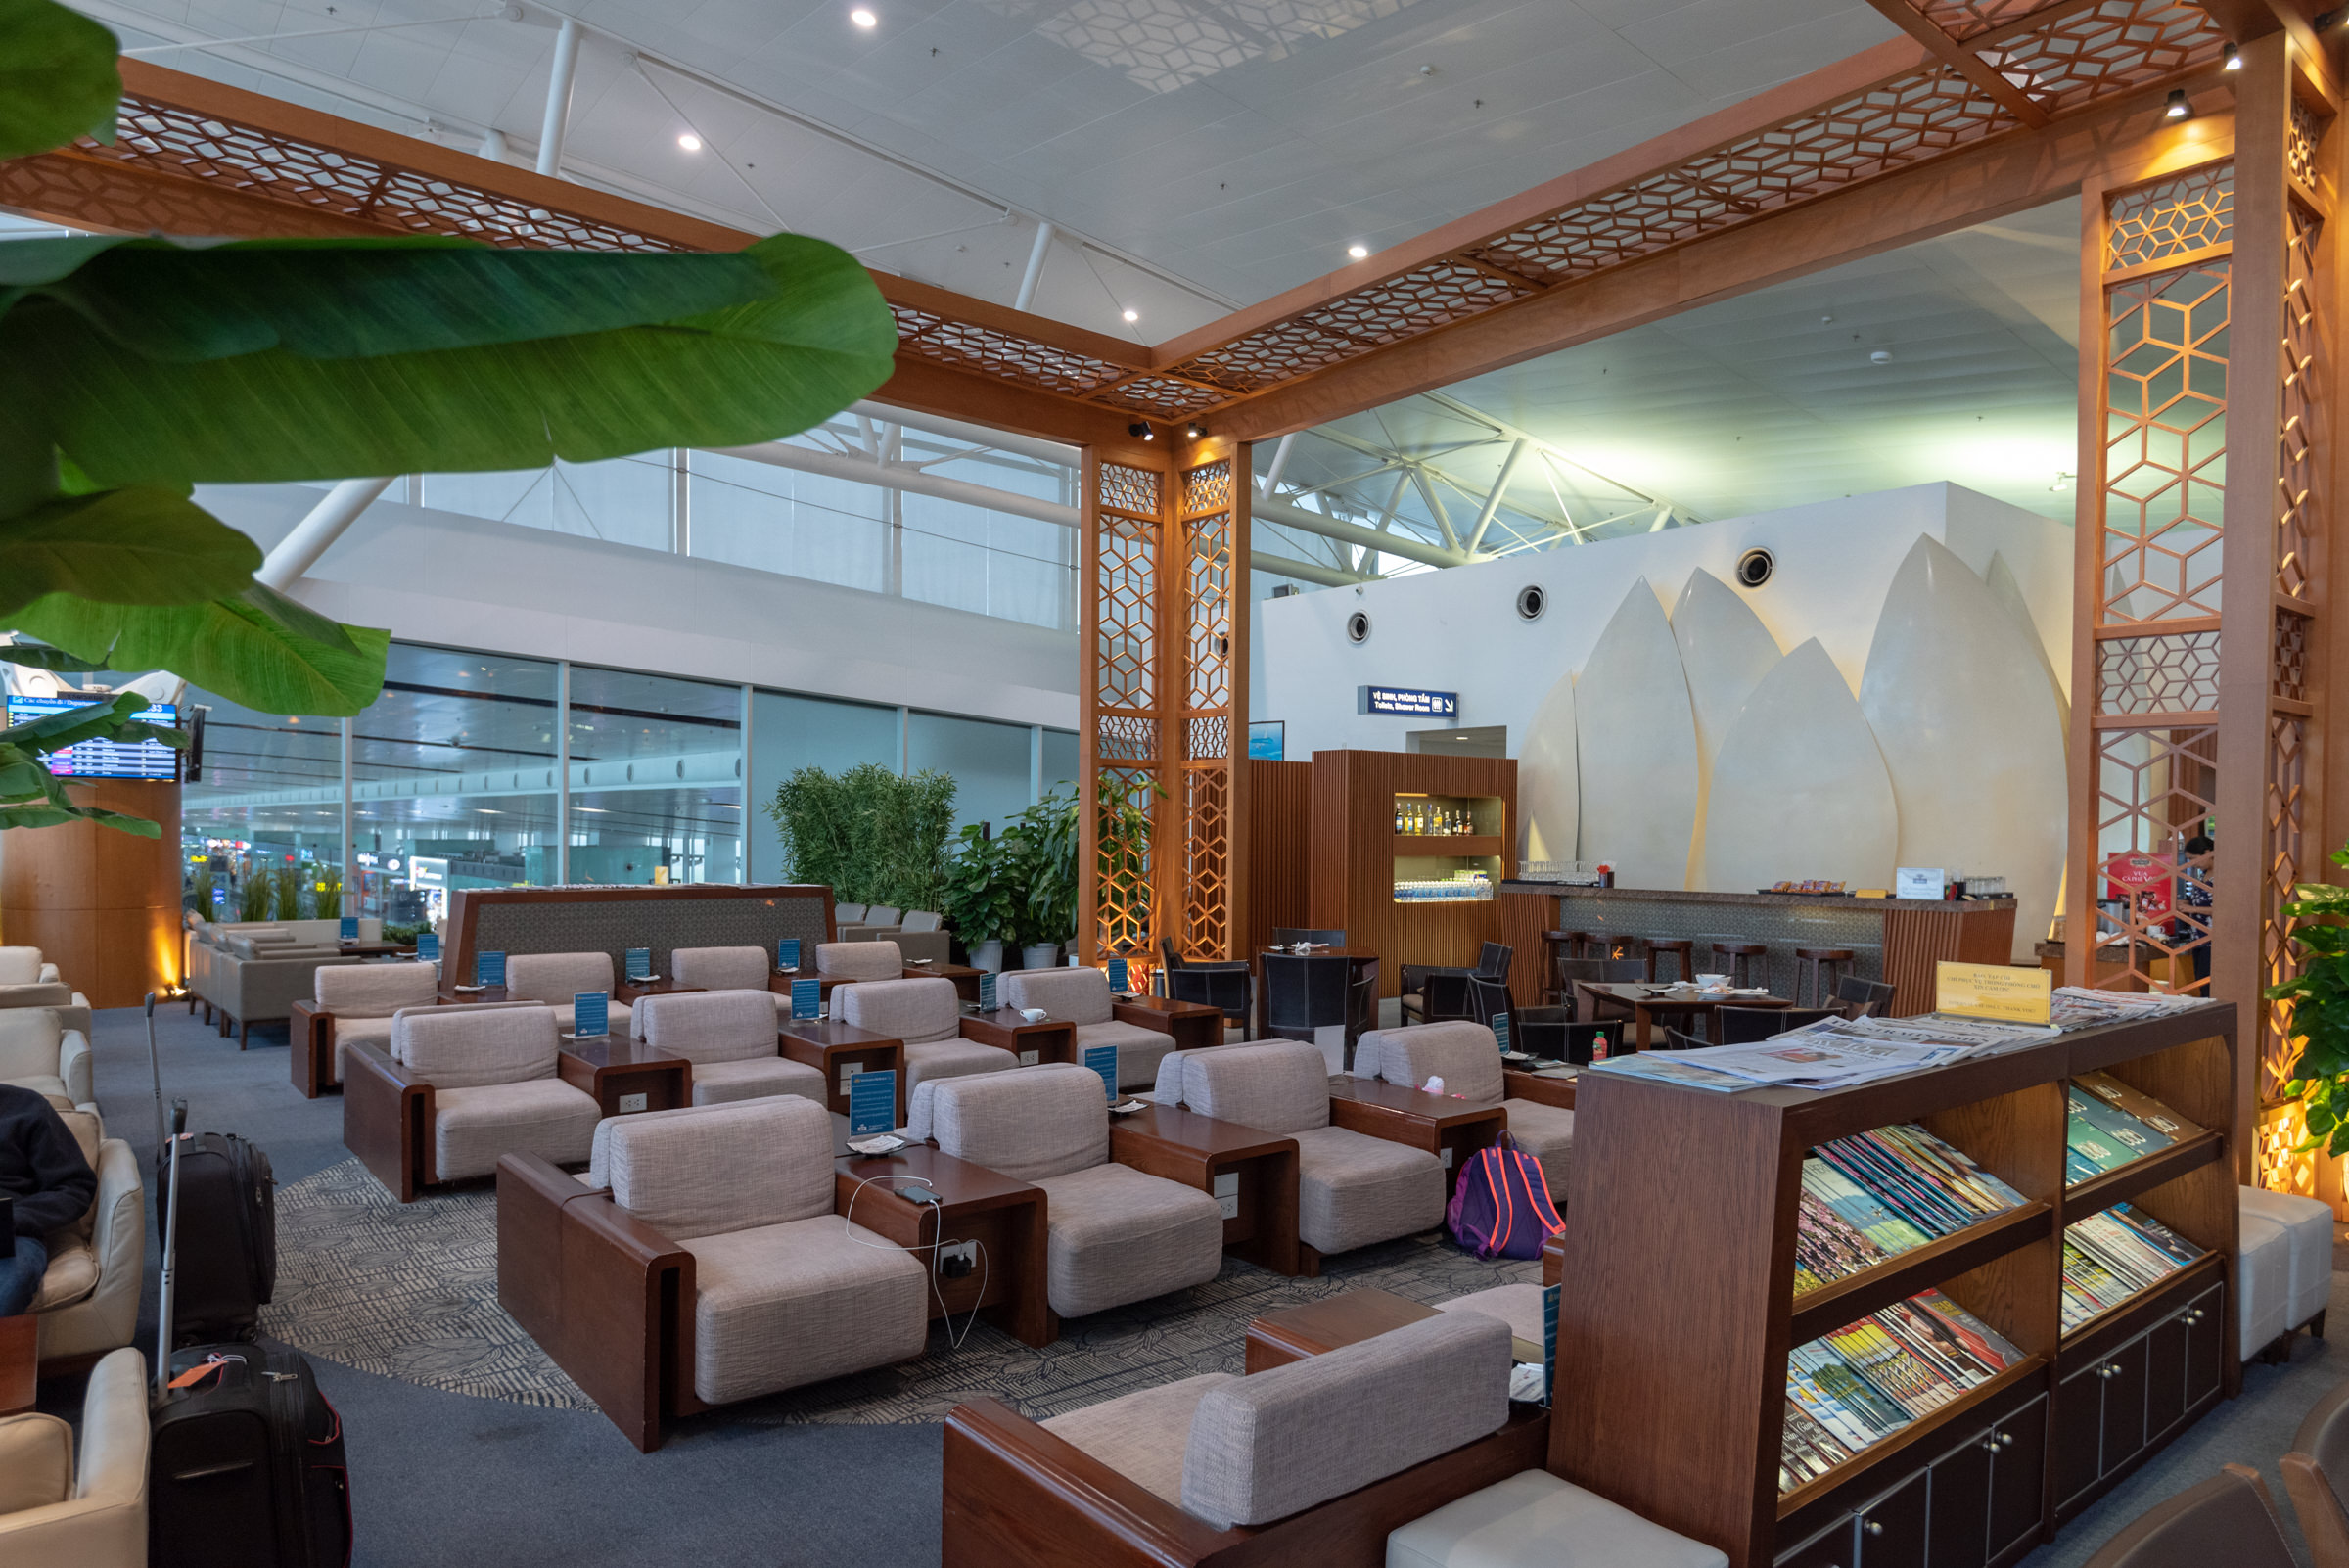 Lounging Area  Vietnam Airlines Lotus Lounge - Noi Bai International Airport